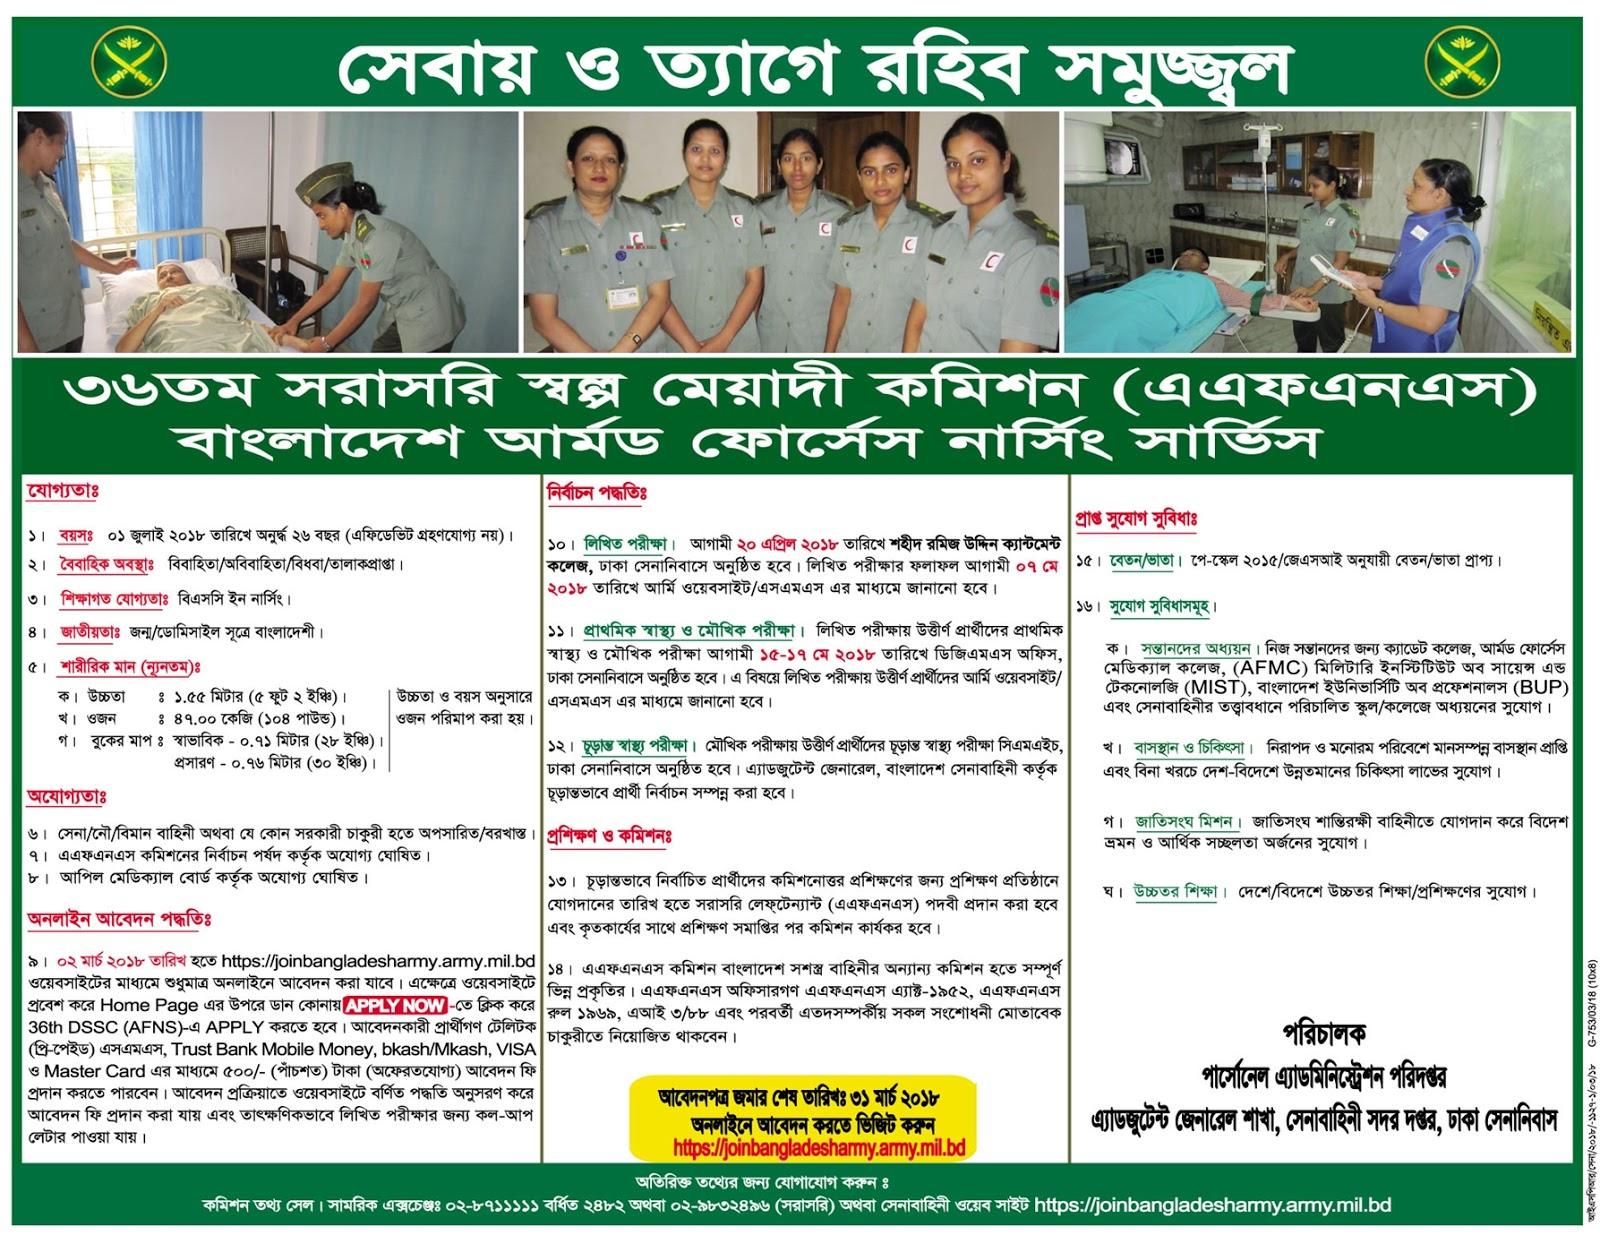 Bangladesh Army 36TH-DSSC - AFNS Nurse Recruitment Circular 2018